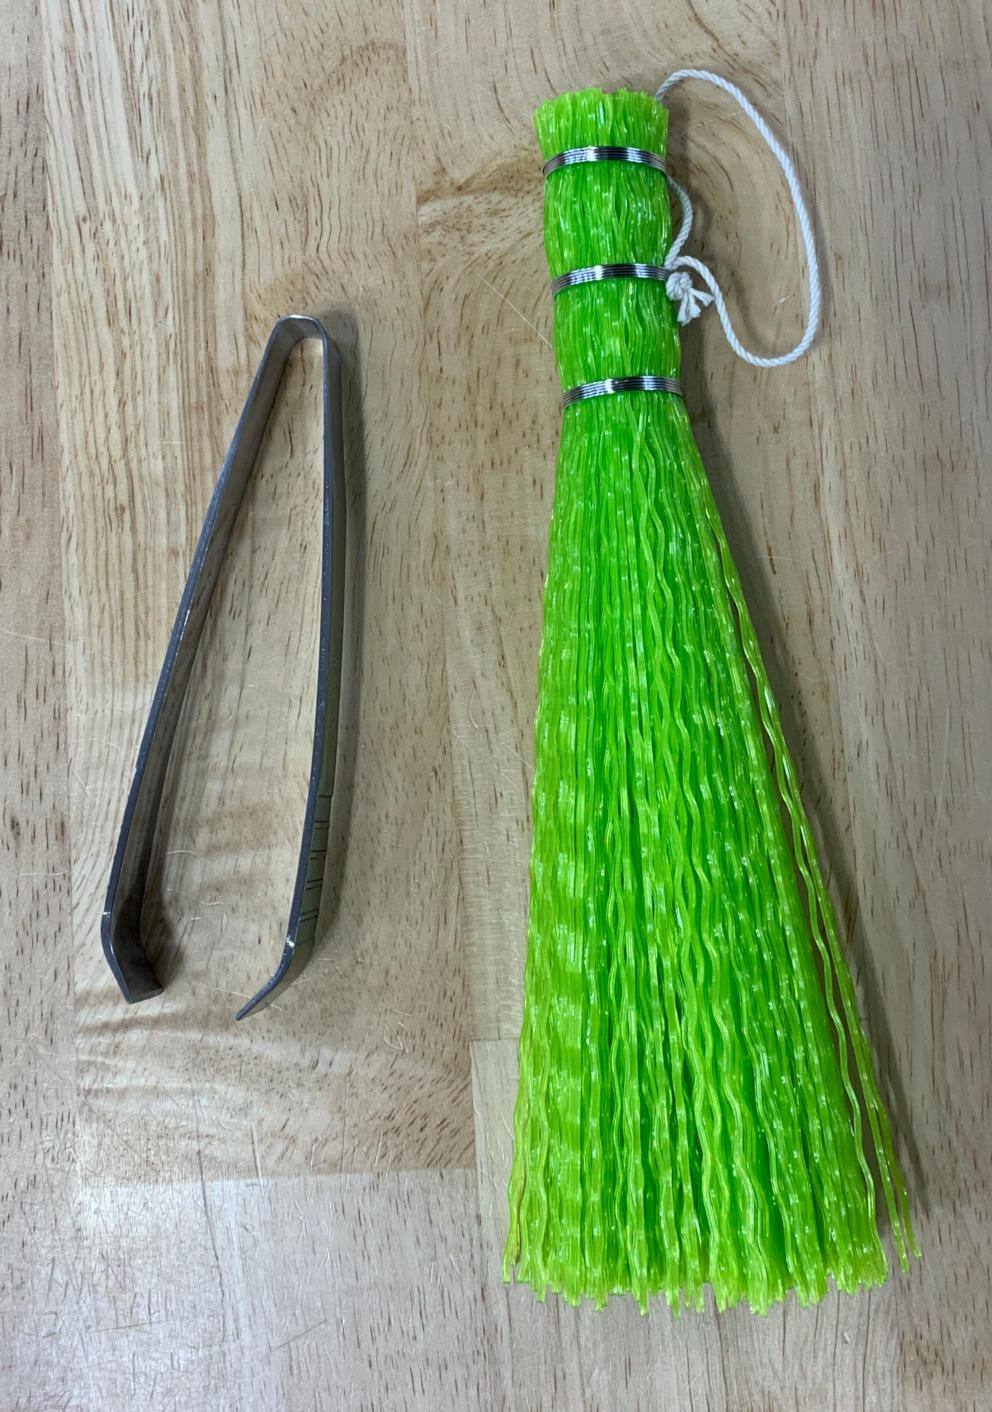 Pinça para Tirar Espinha de Peixe Miura e Sasara - Japao